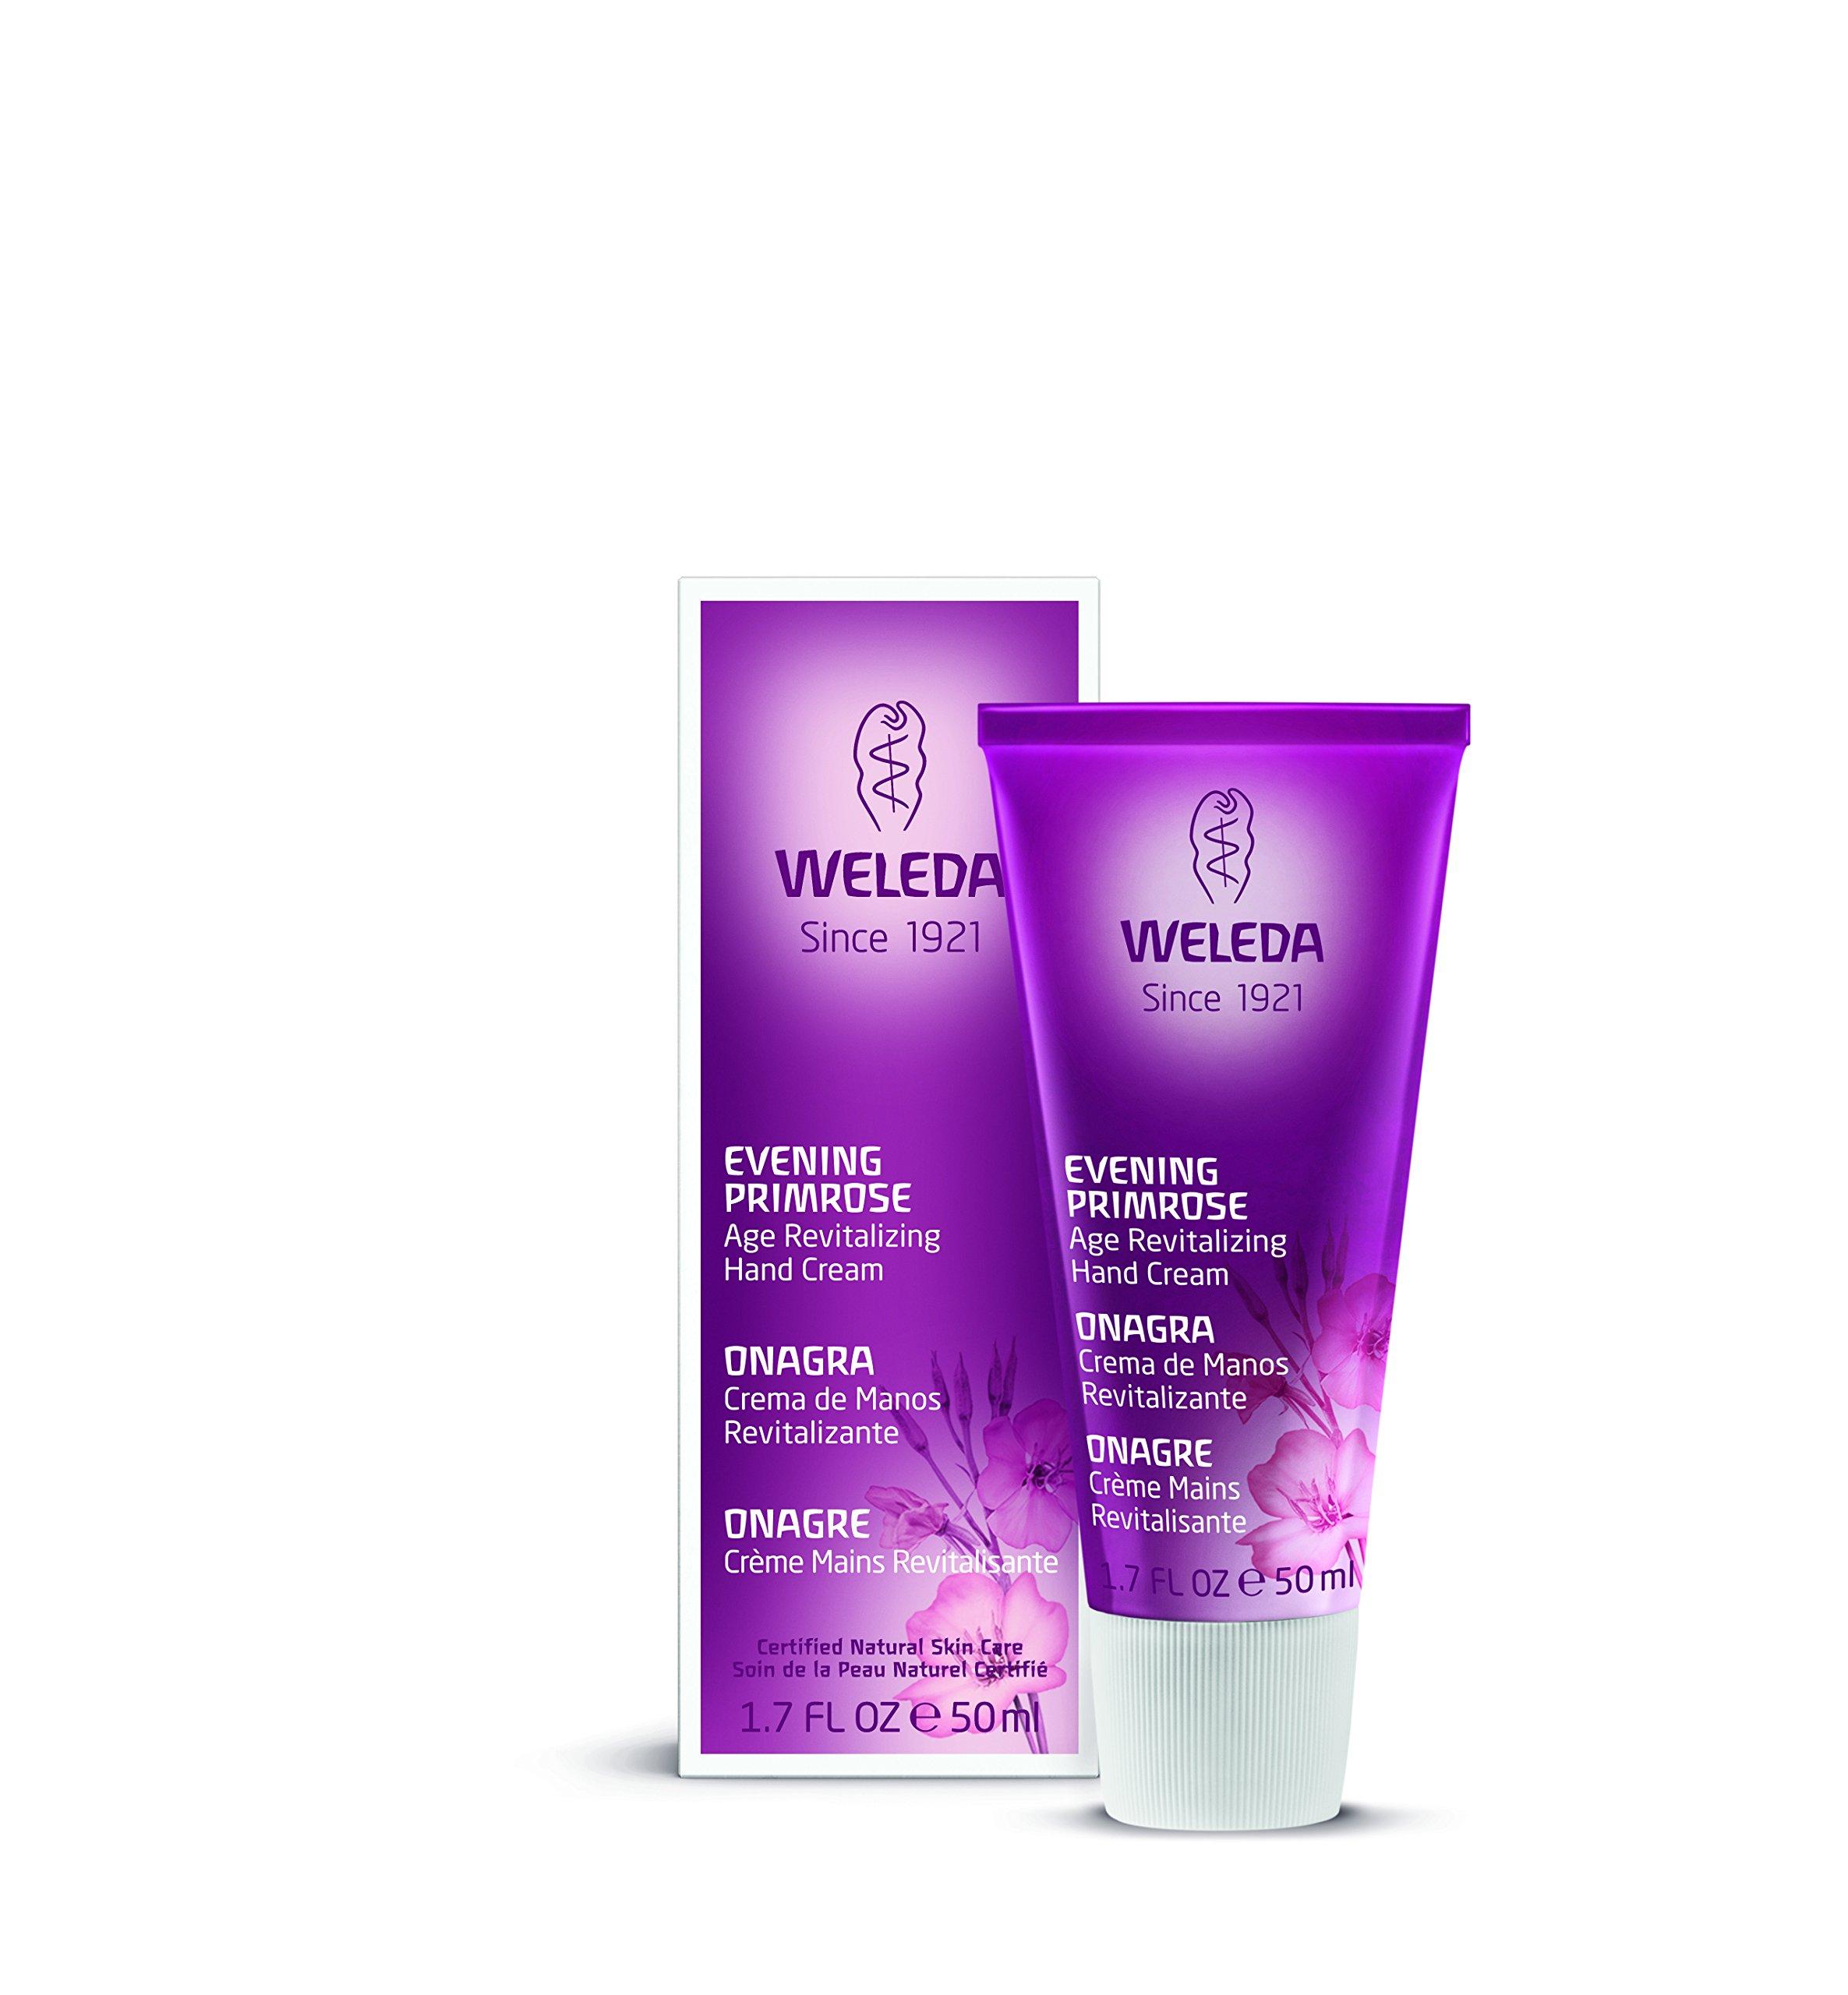 Weleda Evening Primrose Age Revitalizing Hand Cream, 1.7 Fluid Ounce